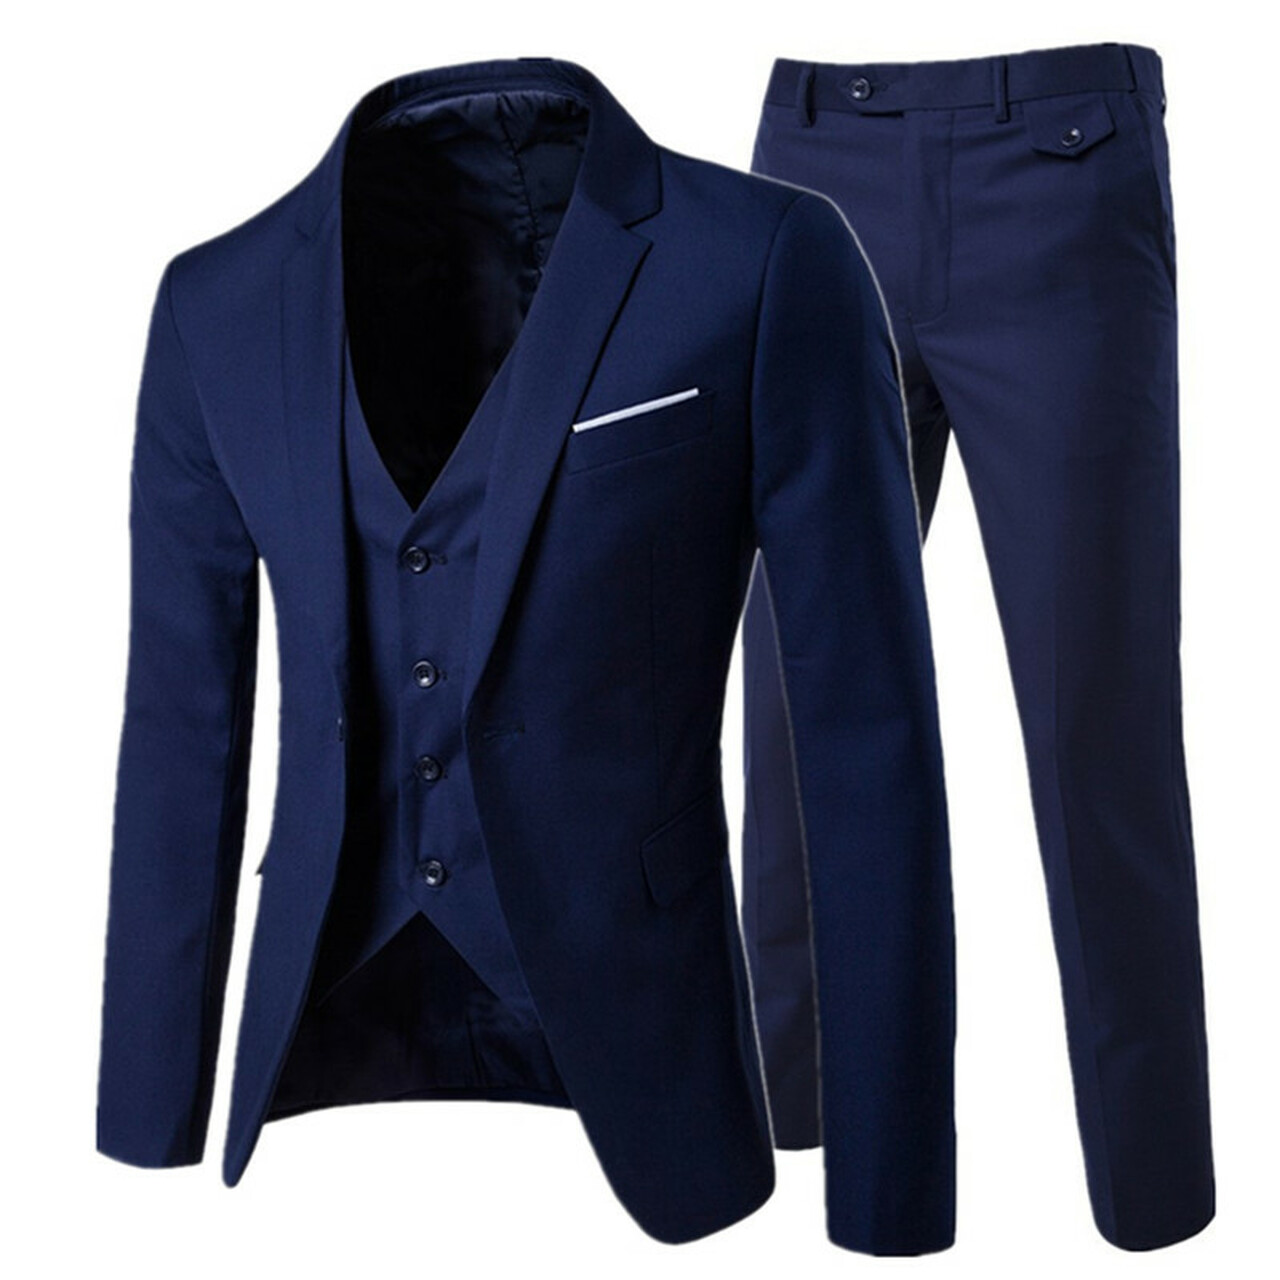 bdab12ac1b9 2018  men s fashion Slim suits men s business casual clothing groomsman  three-piece suit Blazers ...